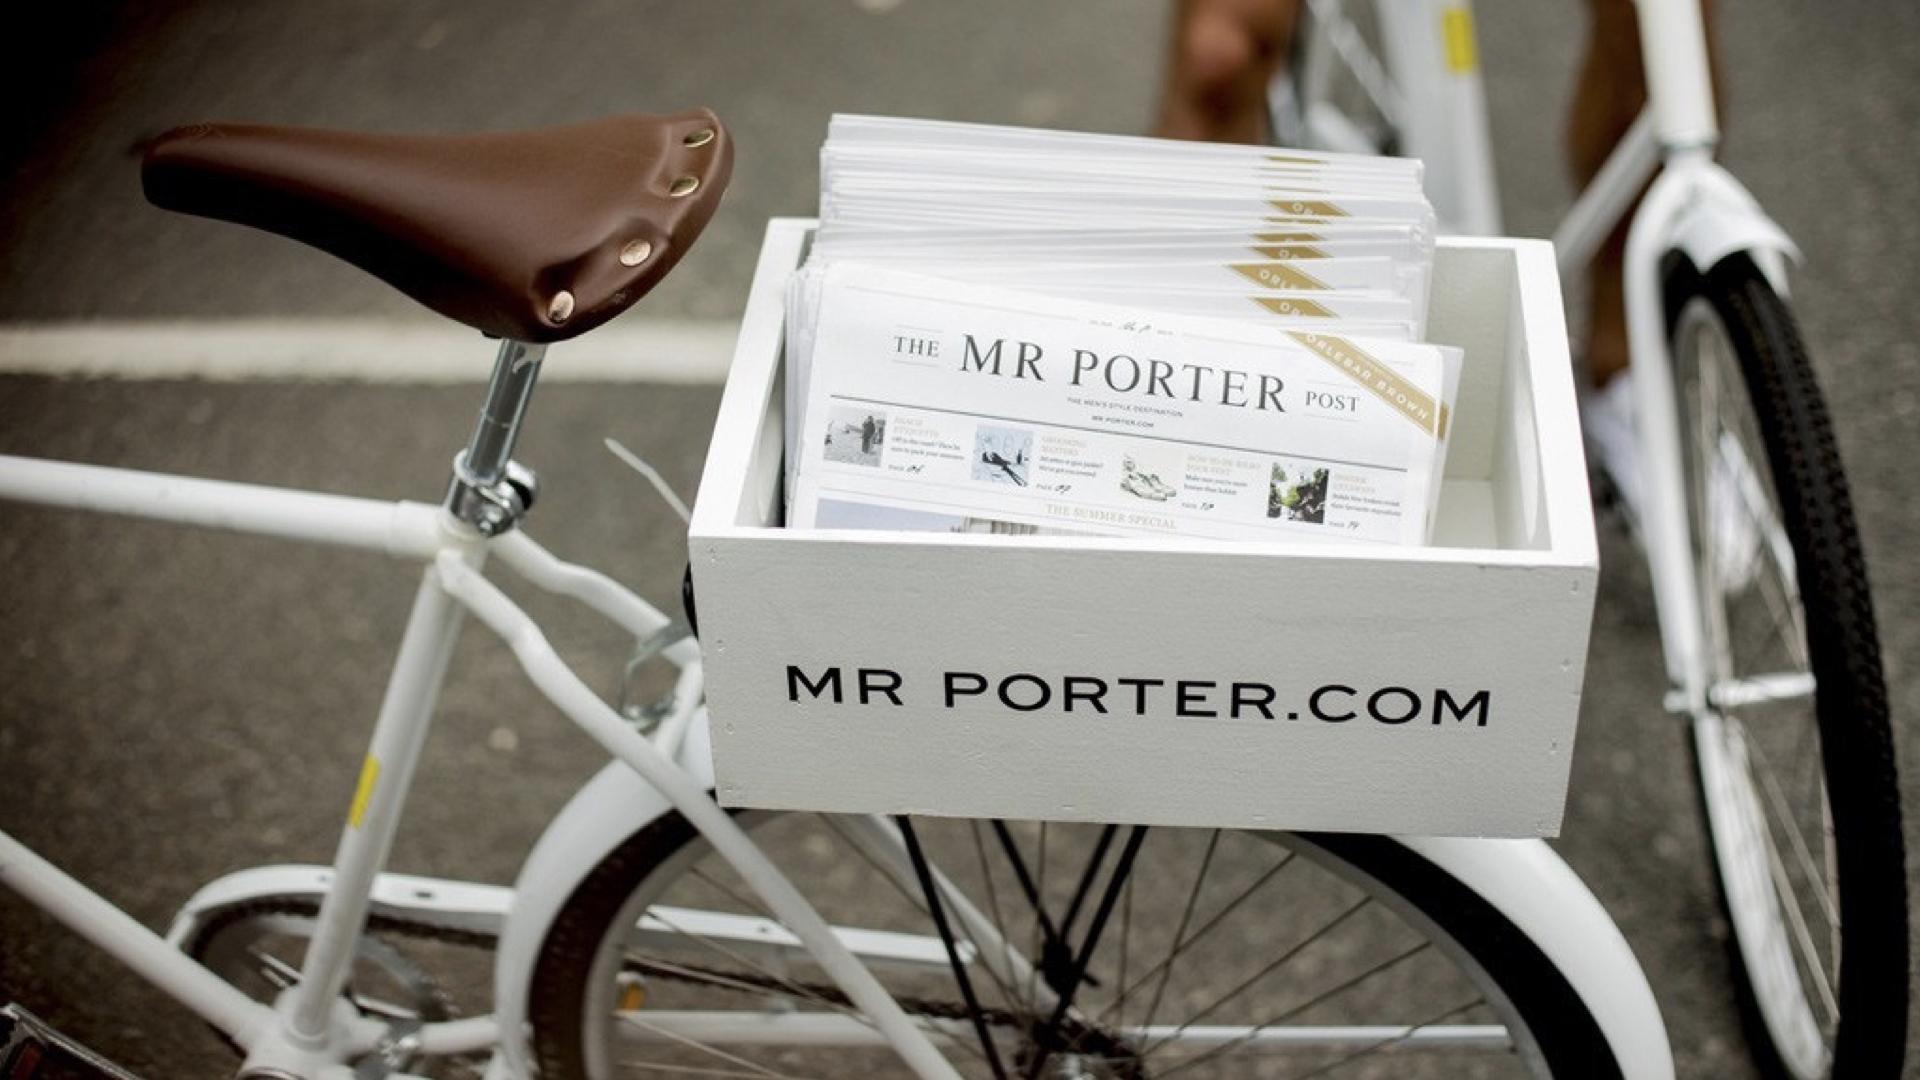 LDN_Mr Porter_Creds Deck.014.jpeg